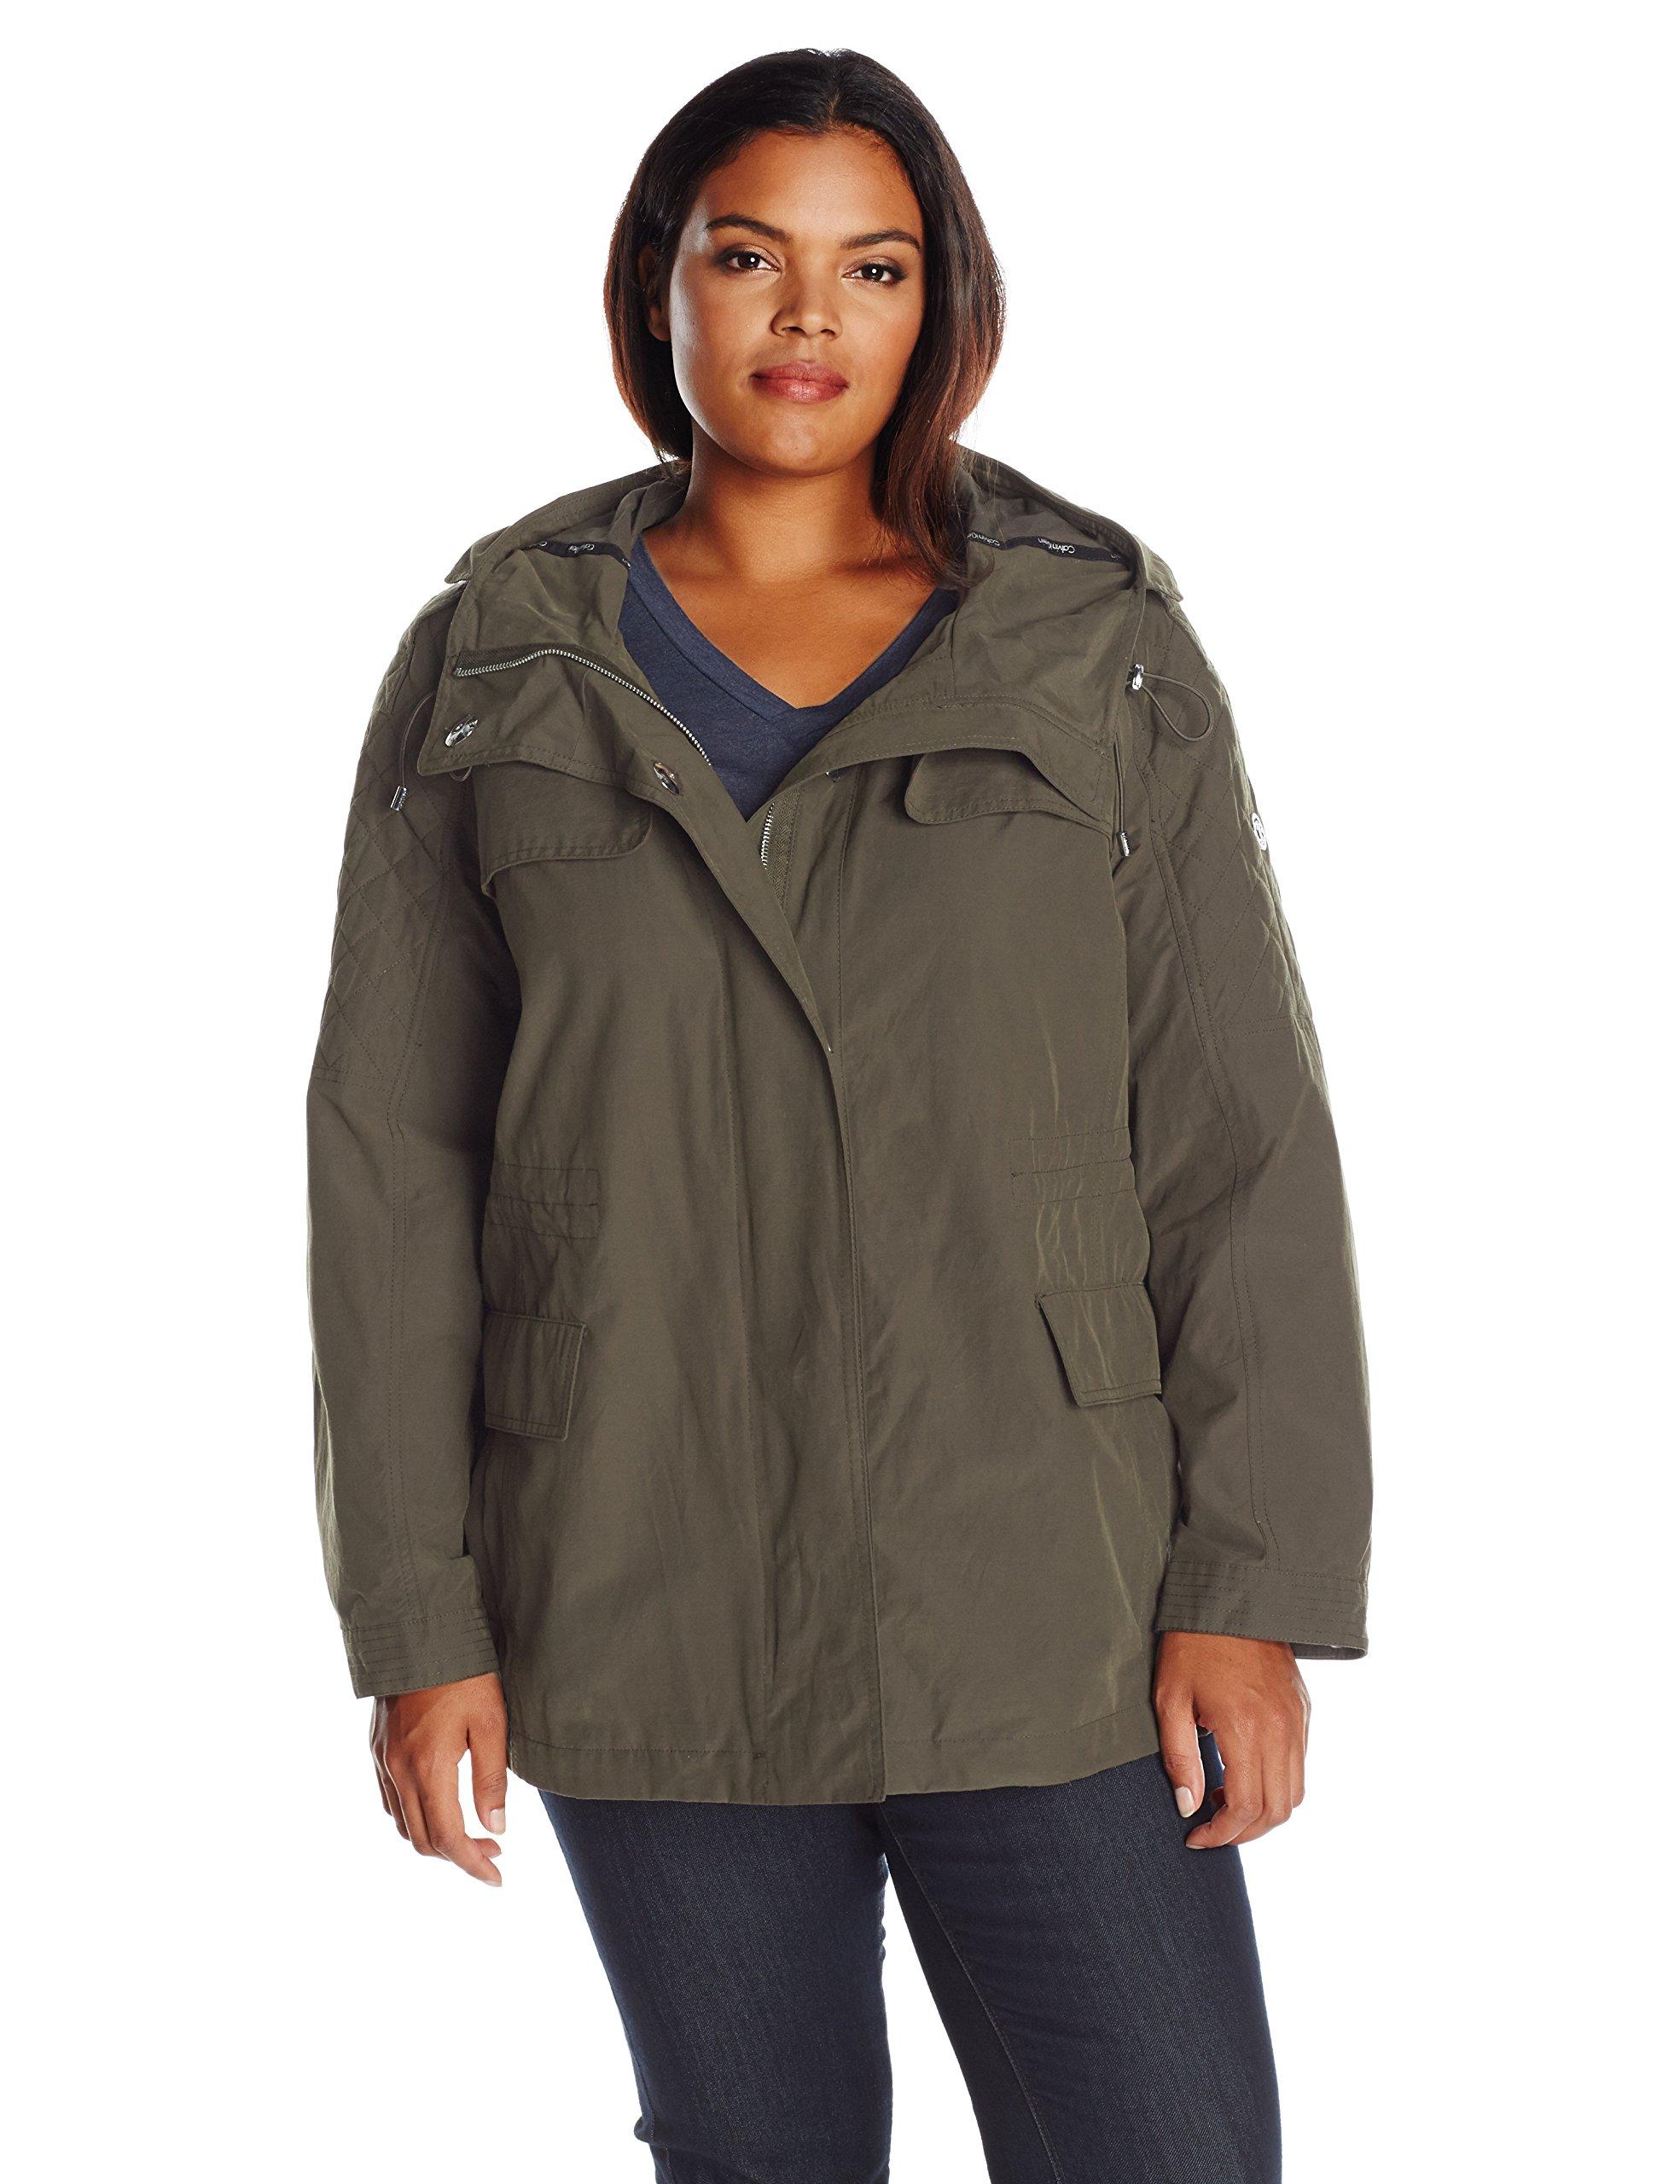 Calvin Klein Women's Plus Size Rain Anorak Cotton Jacket, IVY, 2X